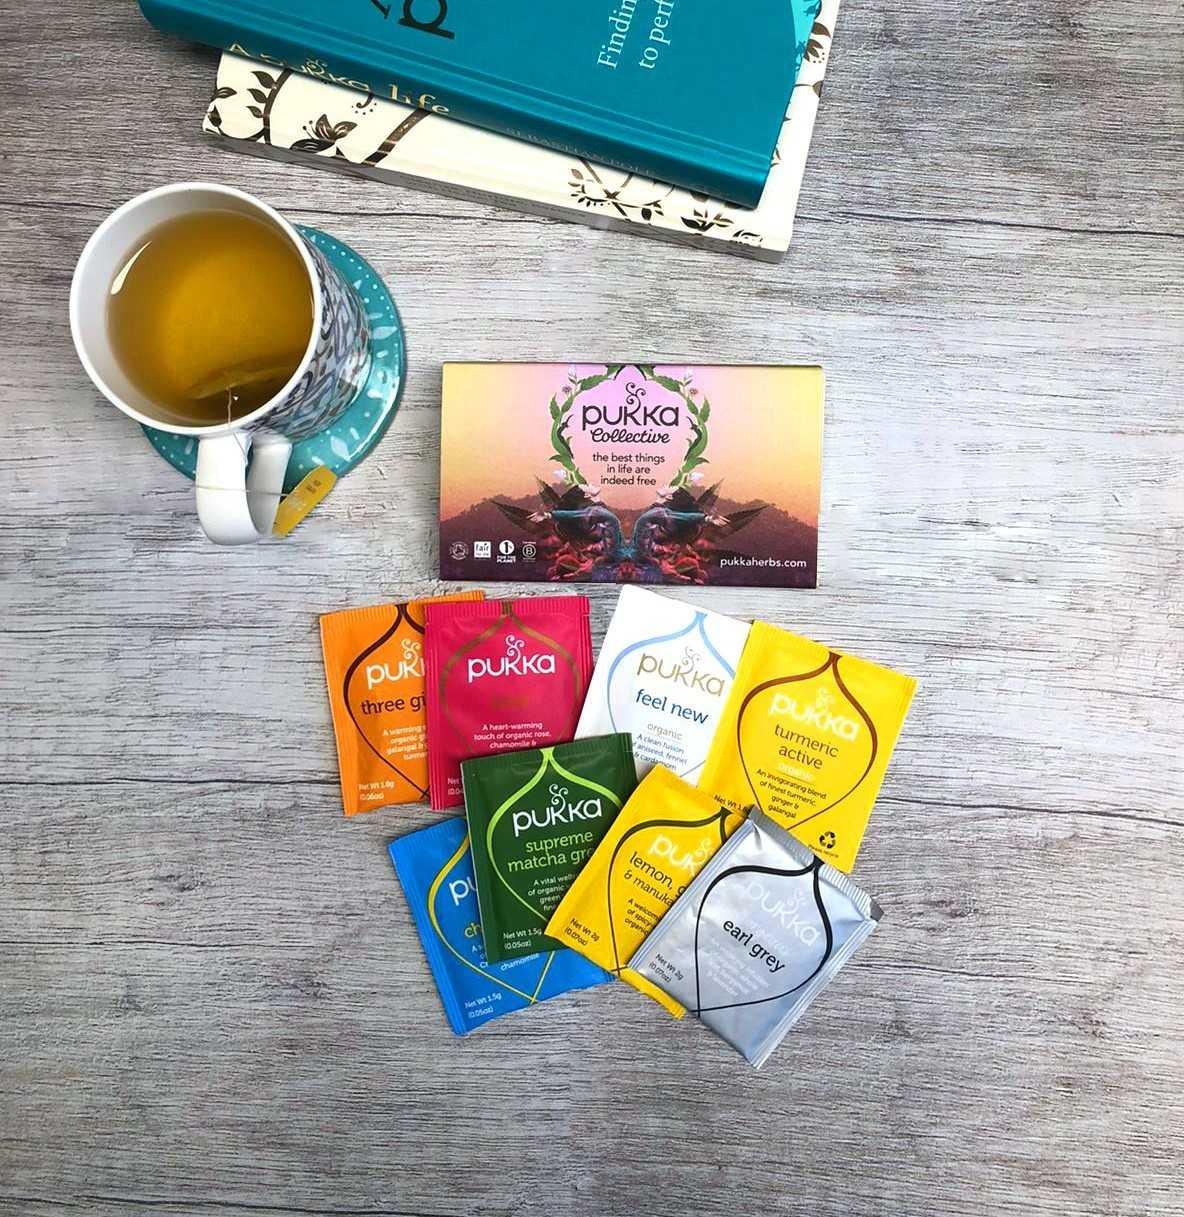 FREE welcome pack including 6 Pukka organic tea sachets (while stocks last) at Pukka Herbs